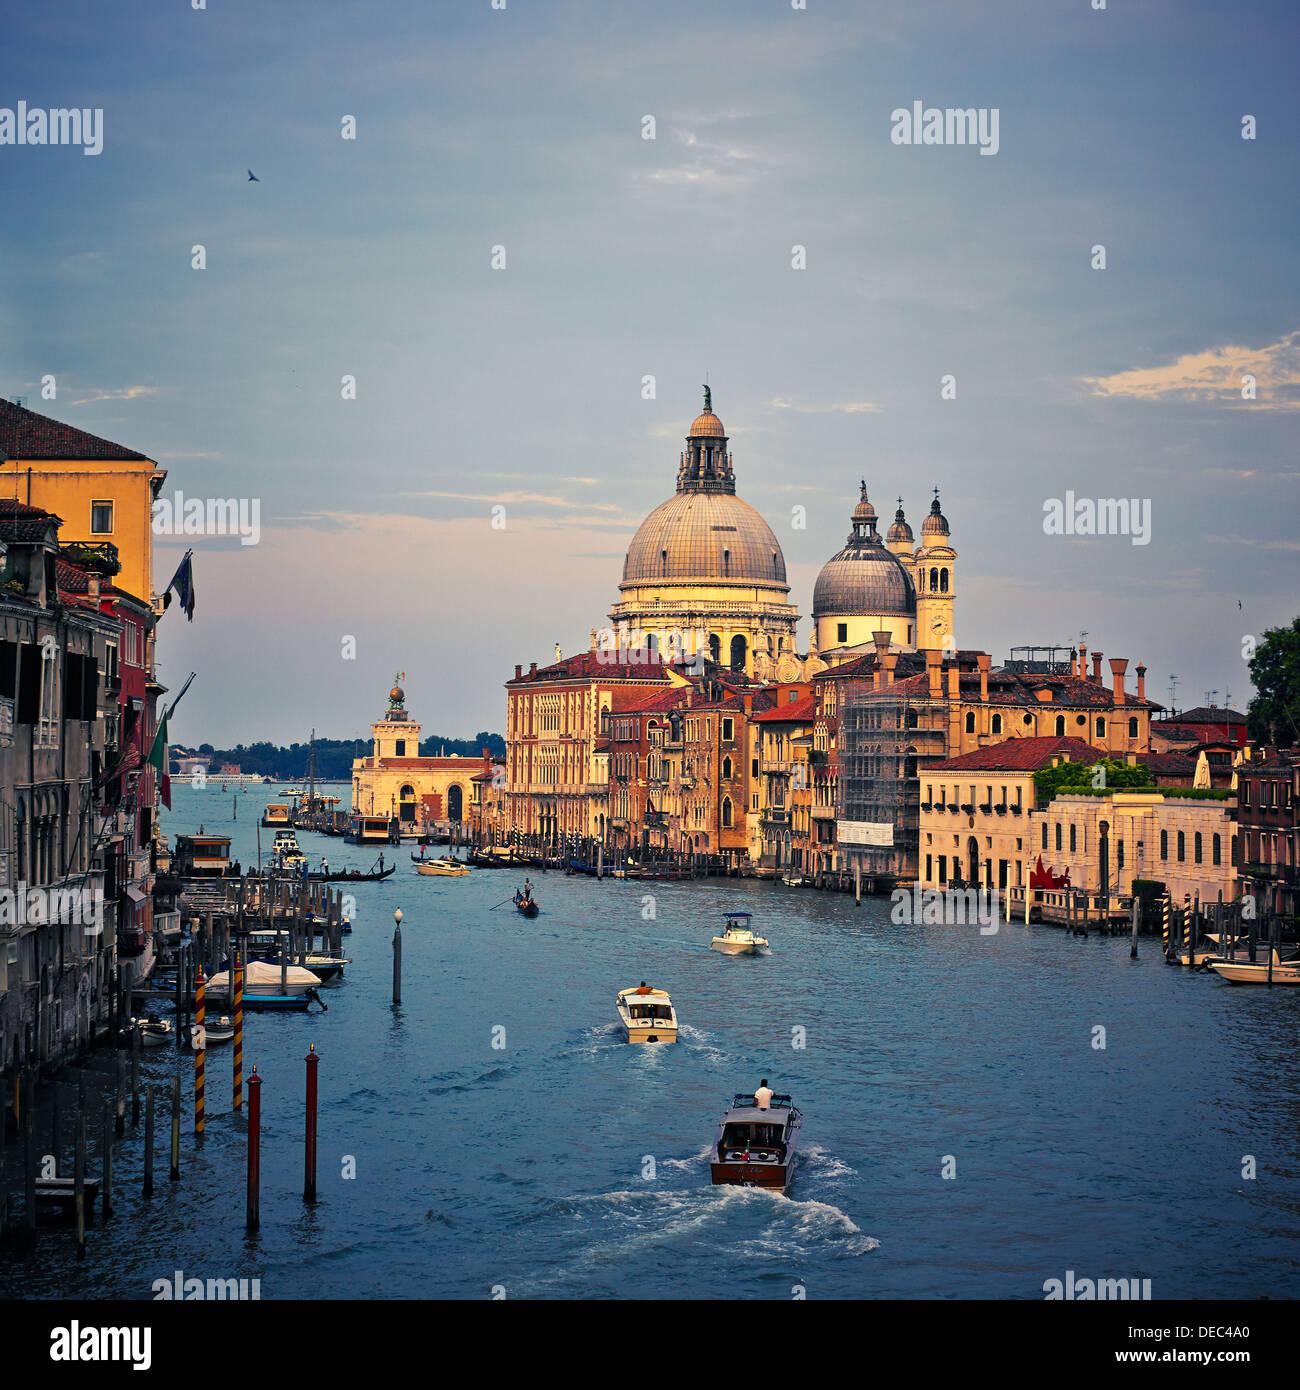 Santa Maria della Salute. View From Academia, Venice, Italy, Europe. - Stock Image